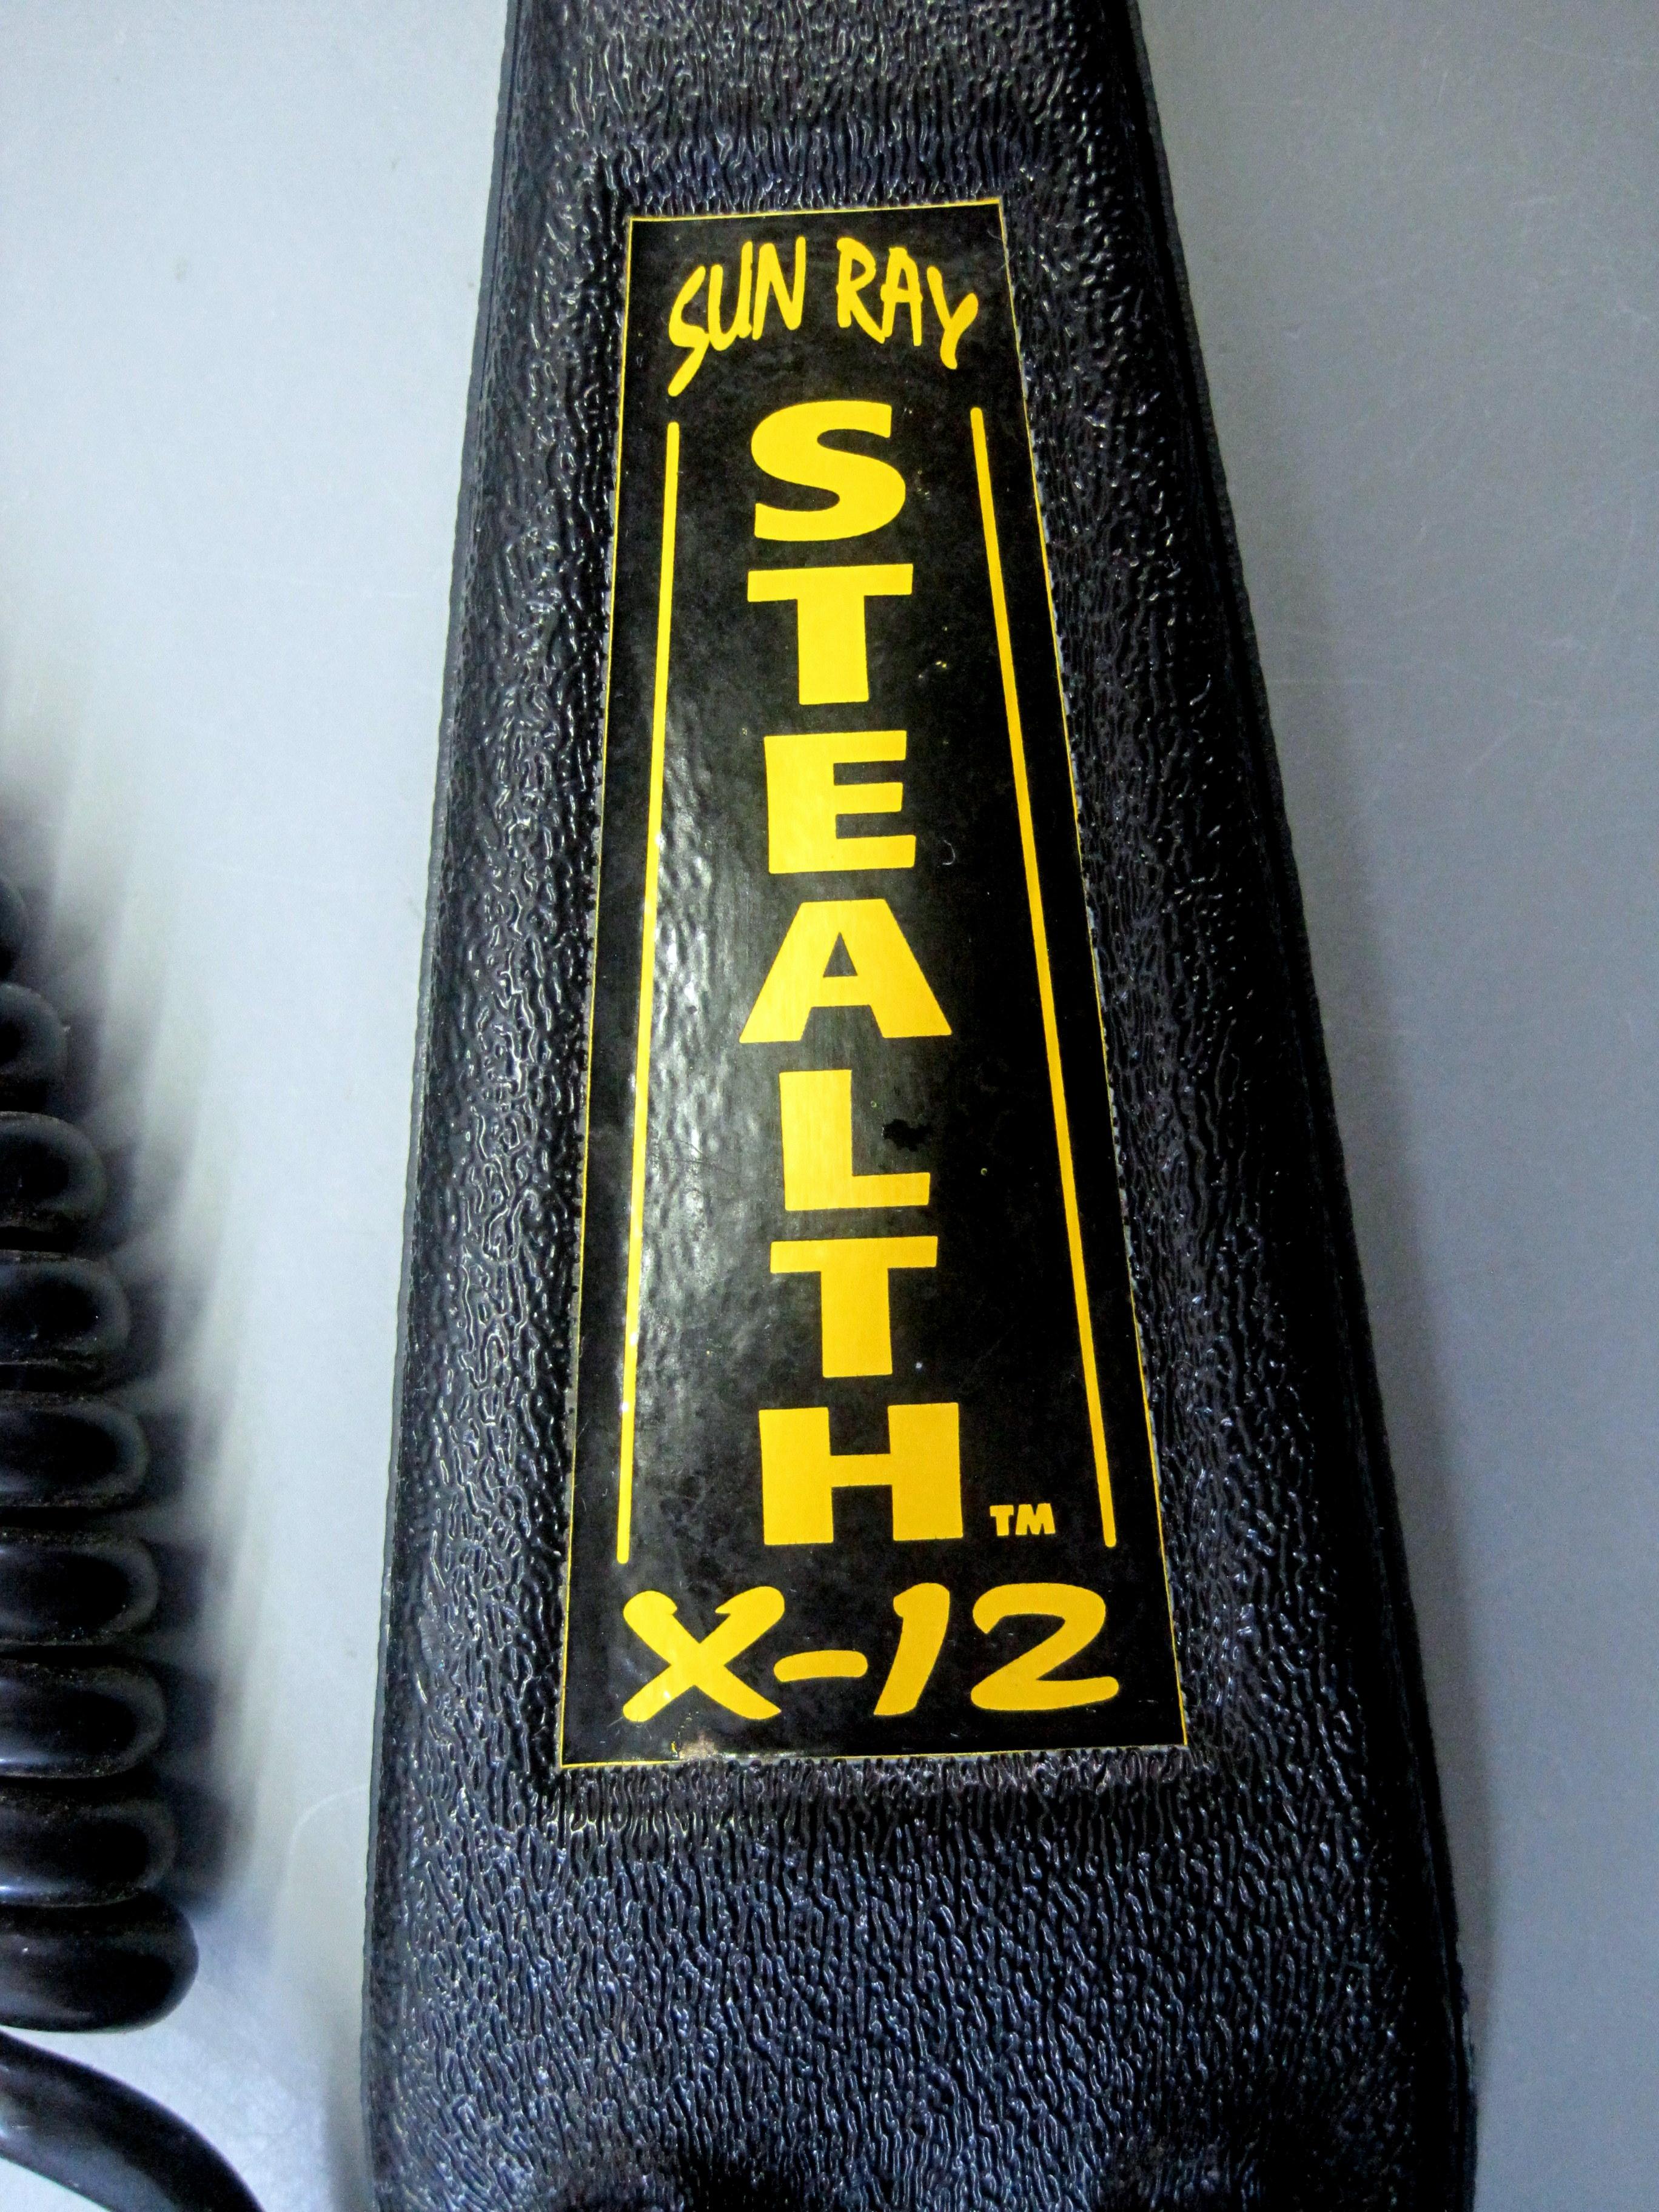 stealthb pro stock metal detectors  at aneh.co